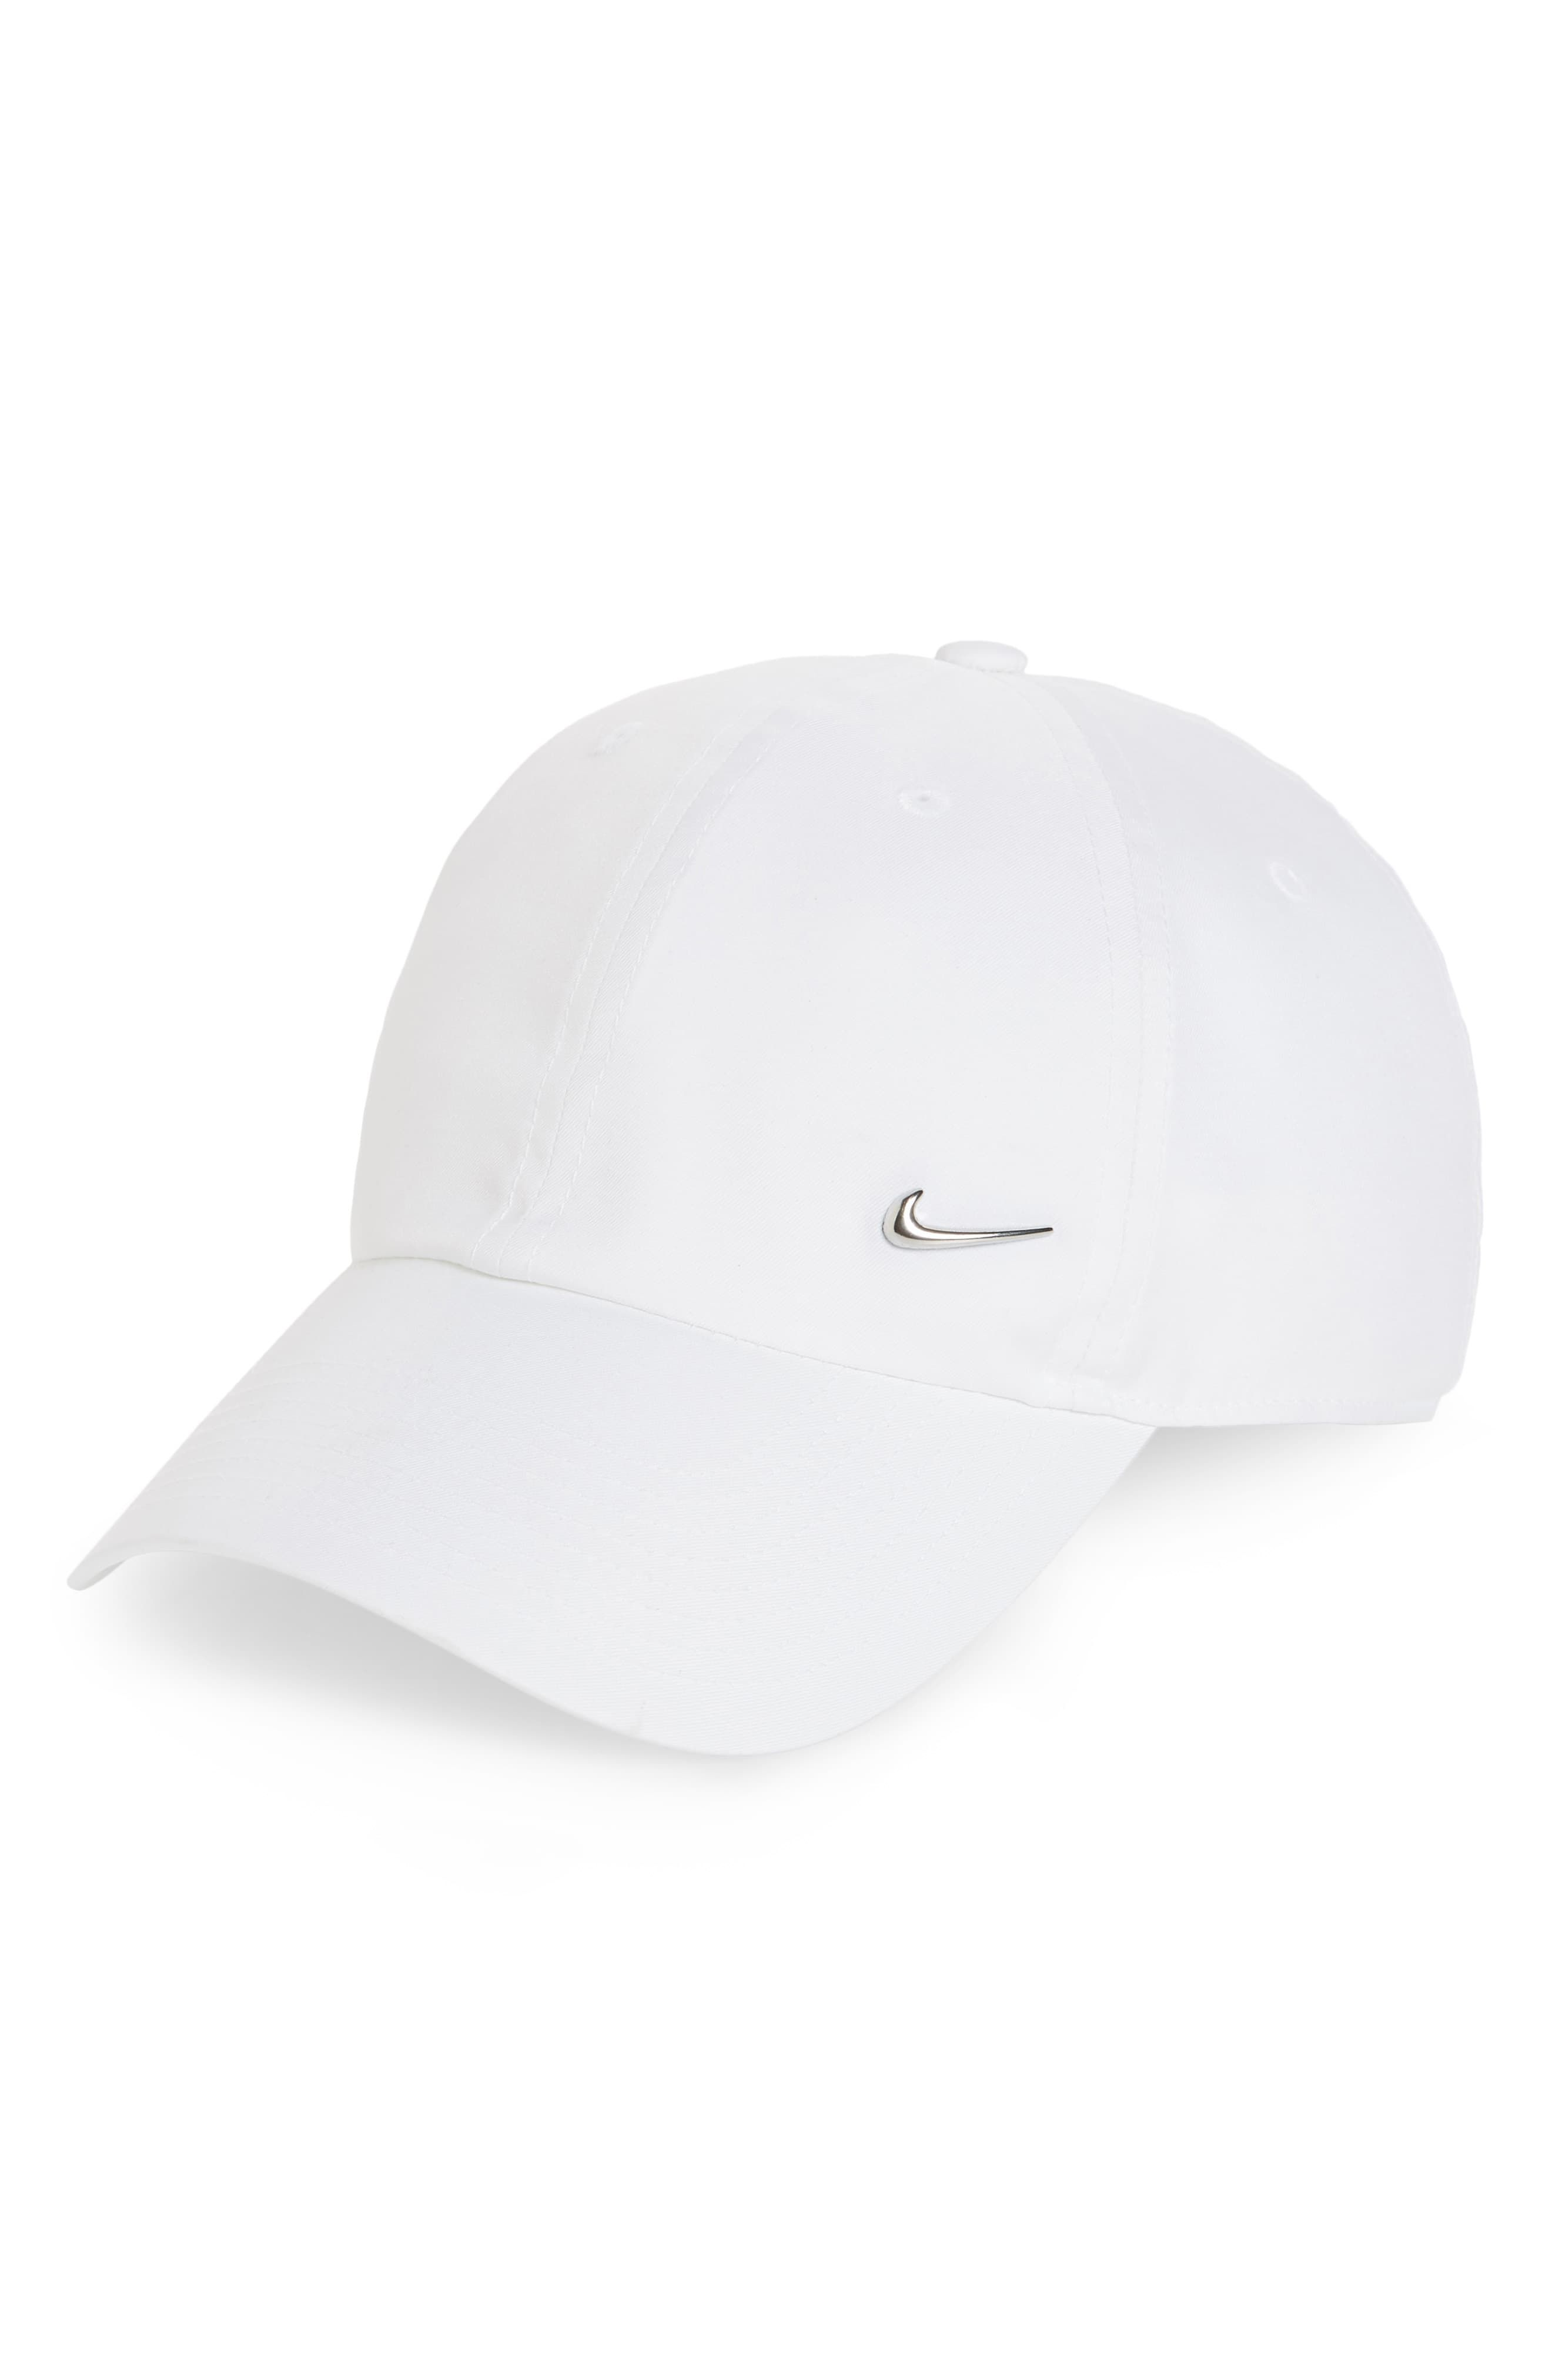 a3ba0af7bac38d Men's Nike Metal Swoosh Baseball Cap - Blue in 2019 | Products ...